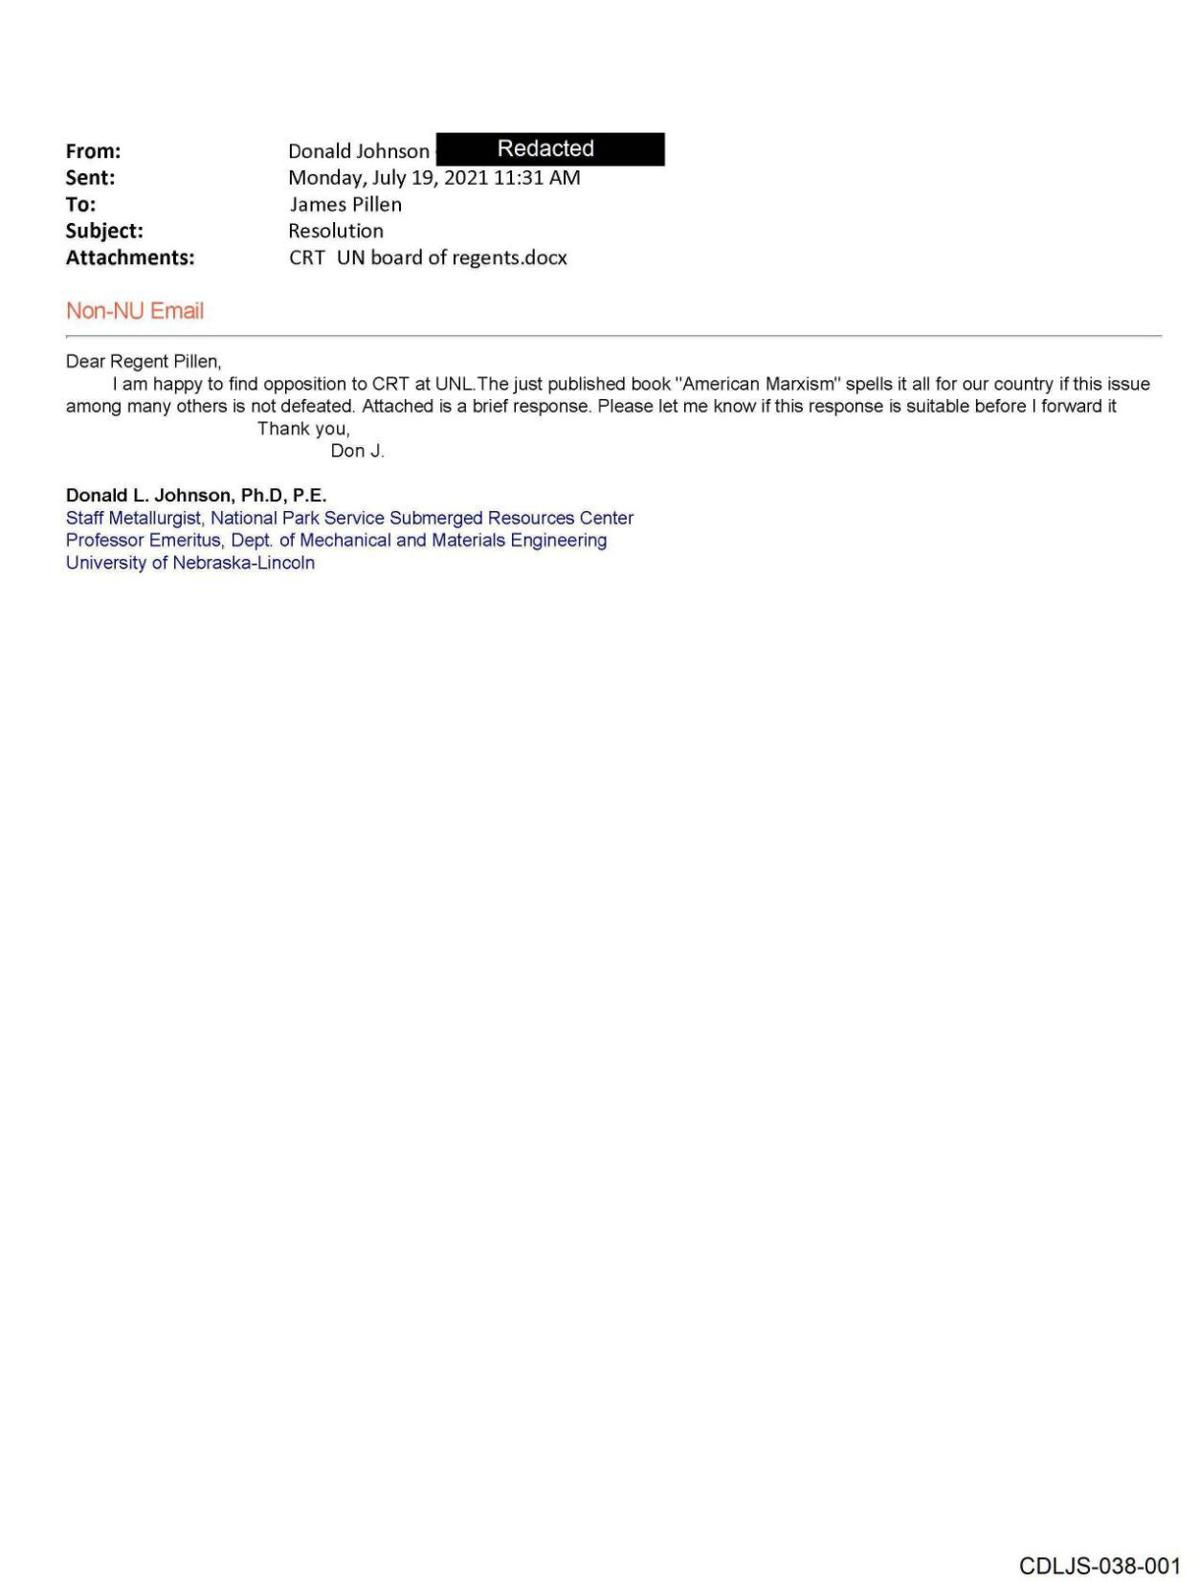 CDLJS-038-001.pdf